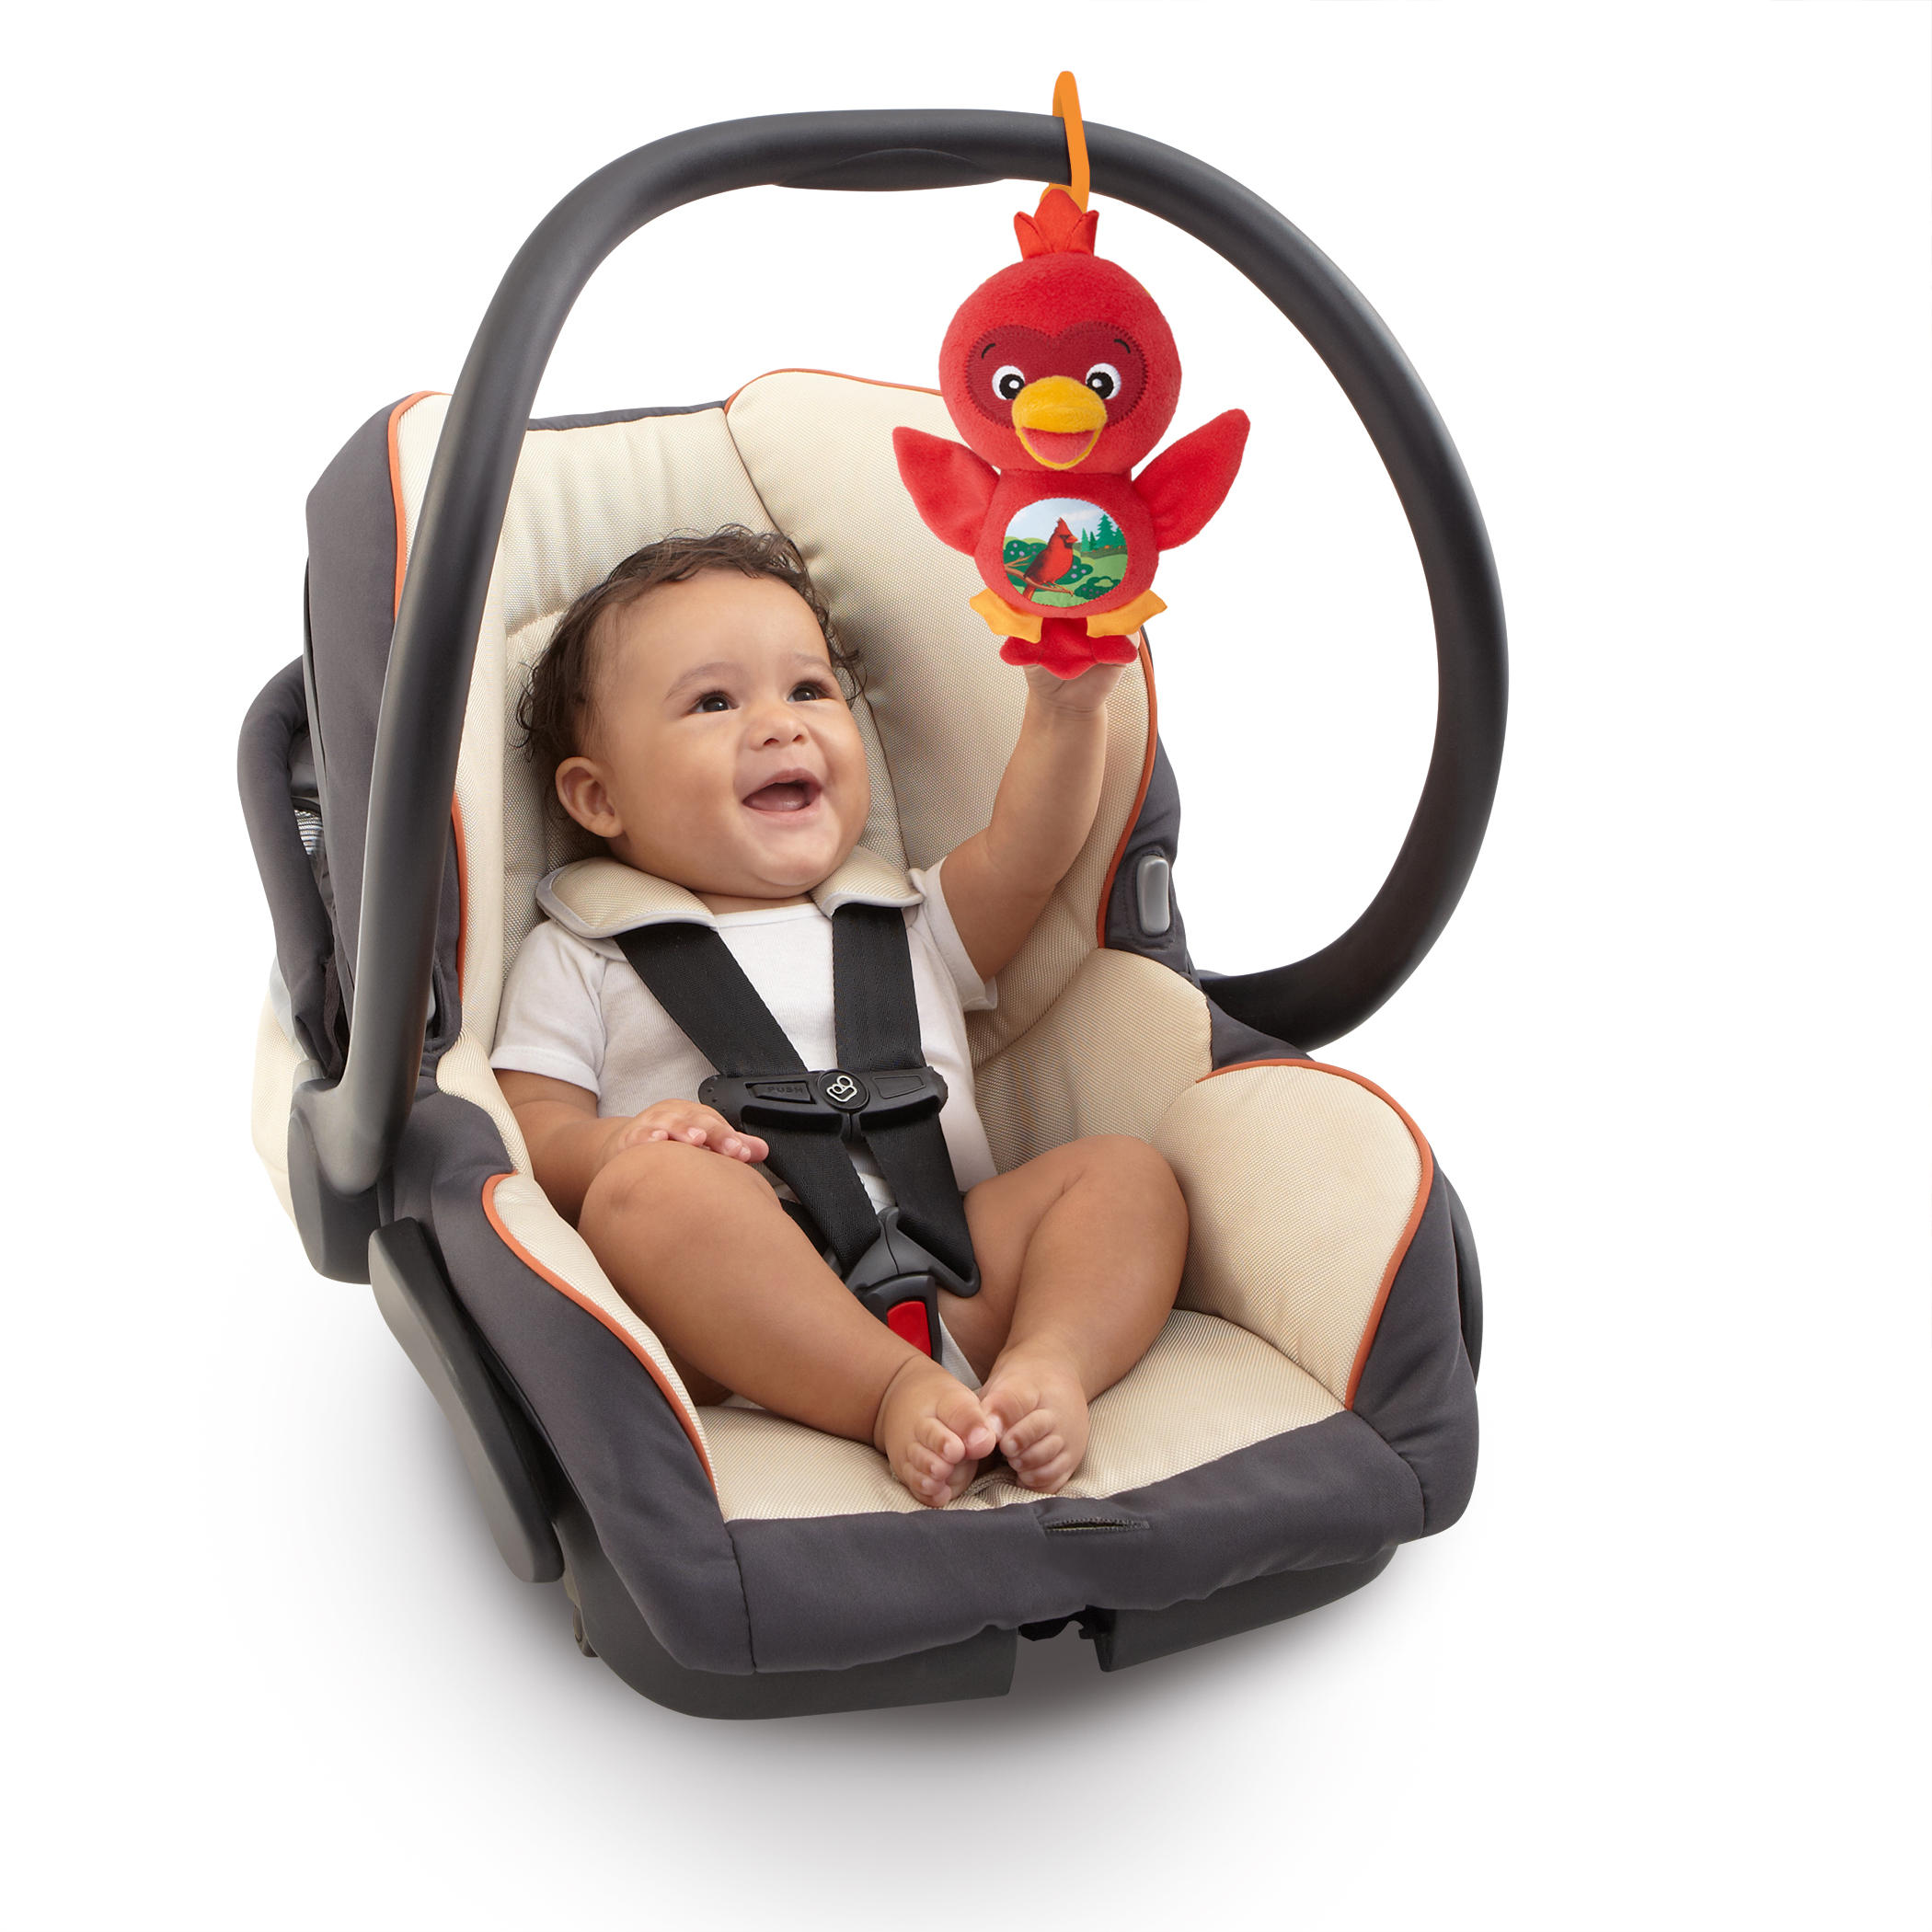 Sing & Play Songbirds™ Take-Along Toys